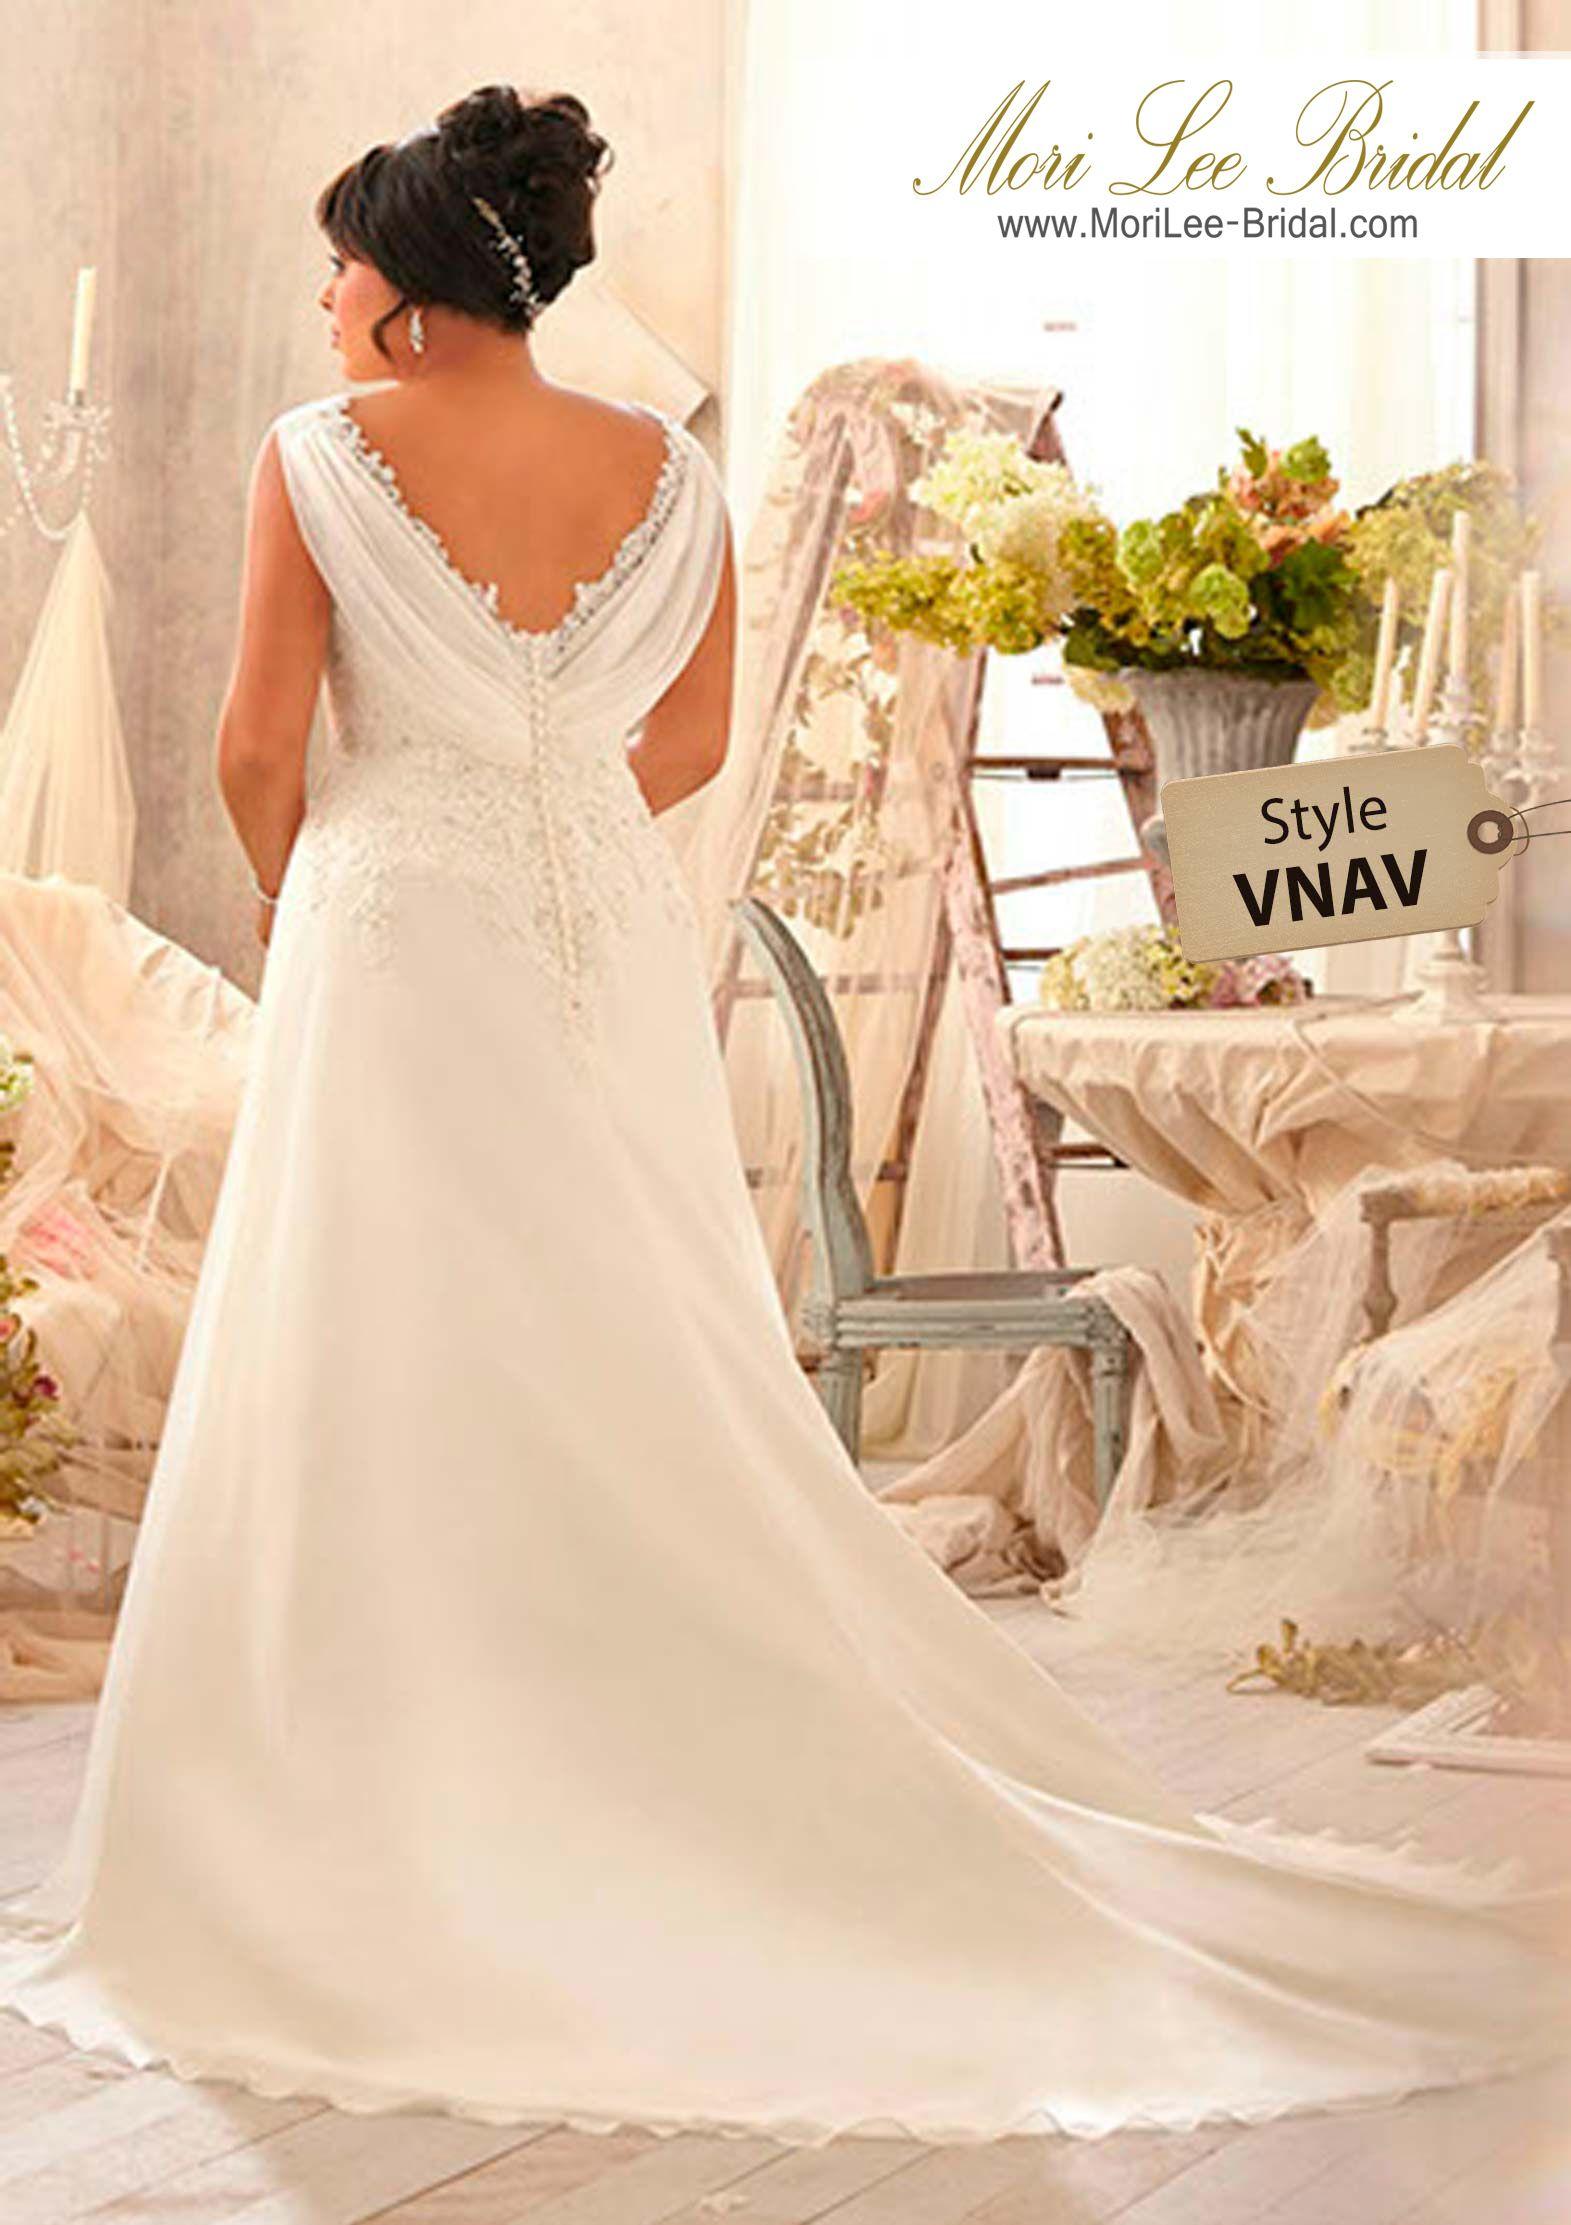 Dress style vnav alencon lace appliques on delicate chiffon colors